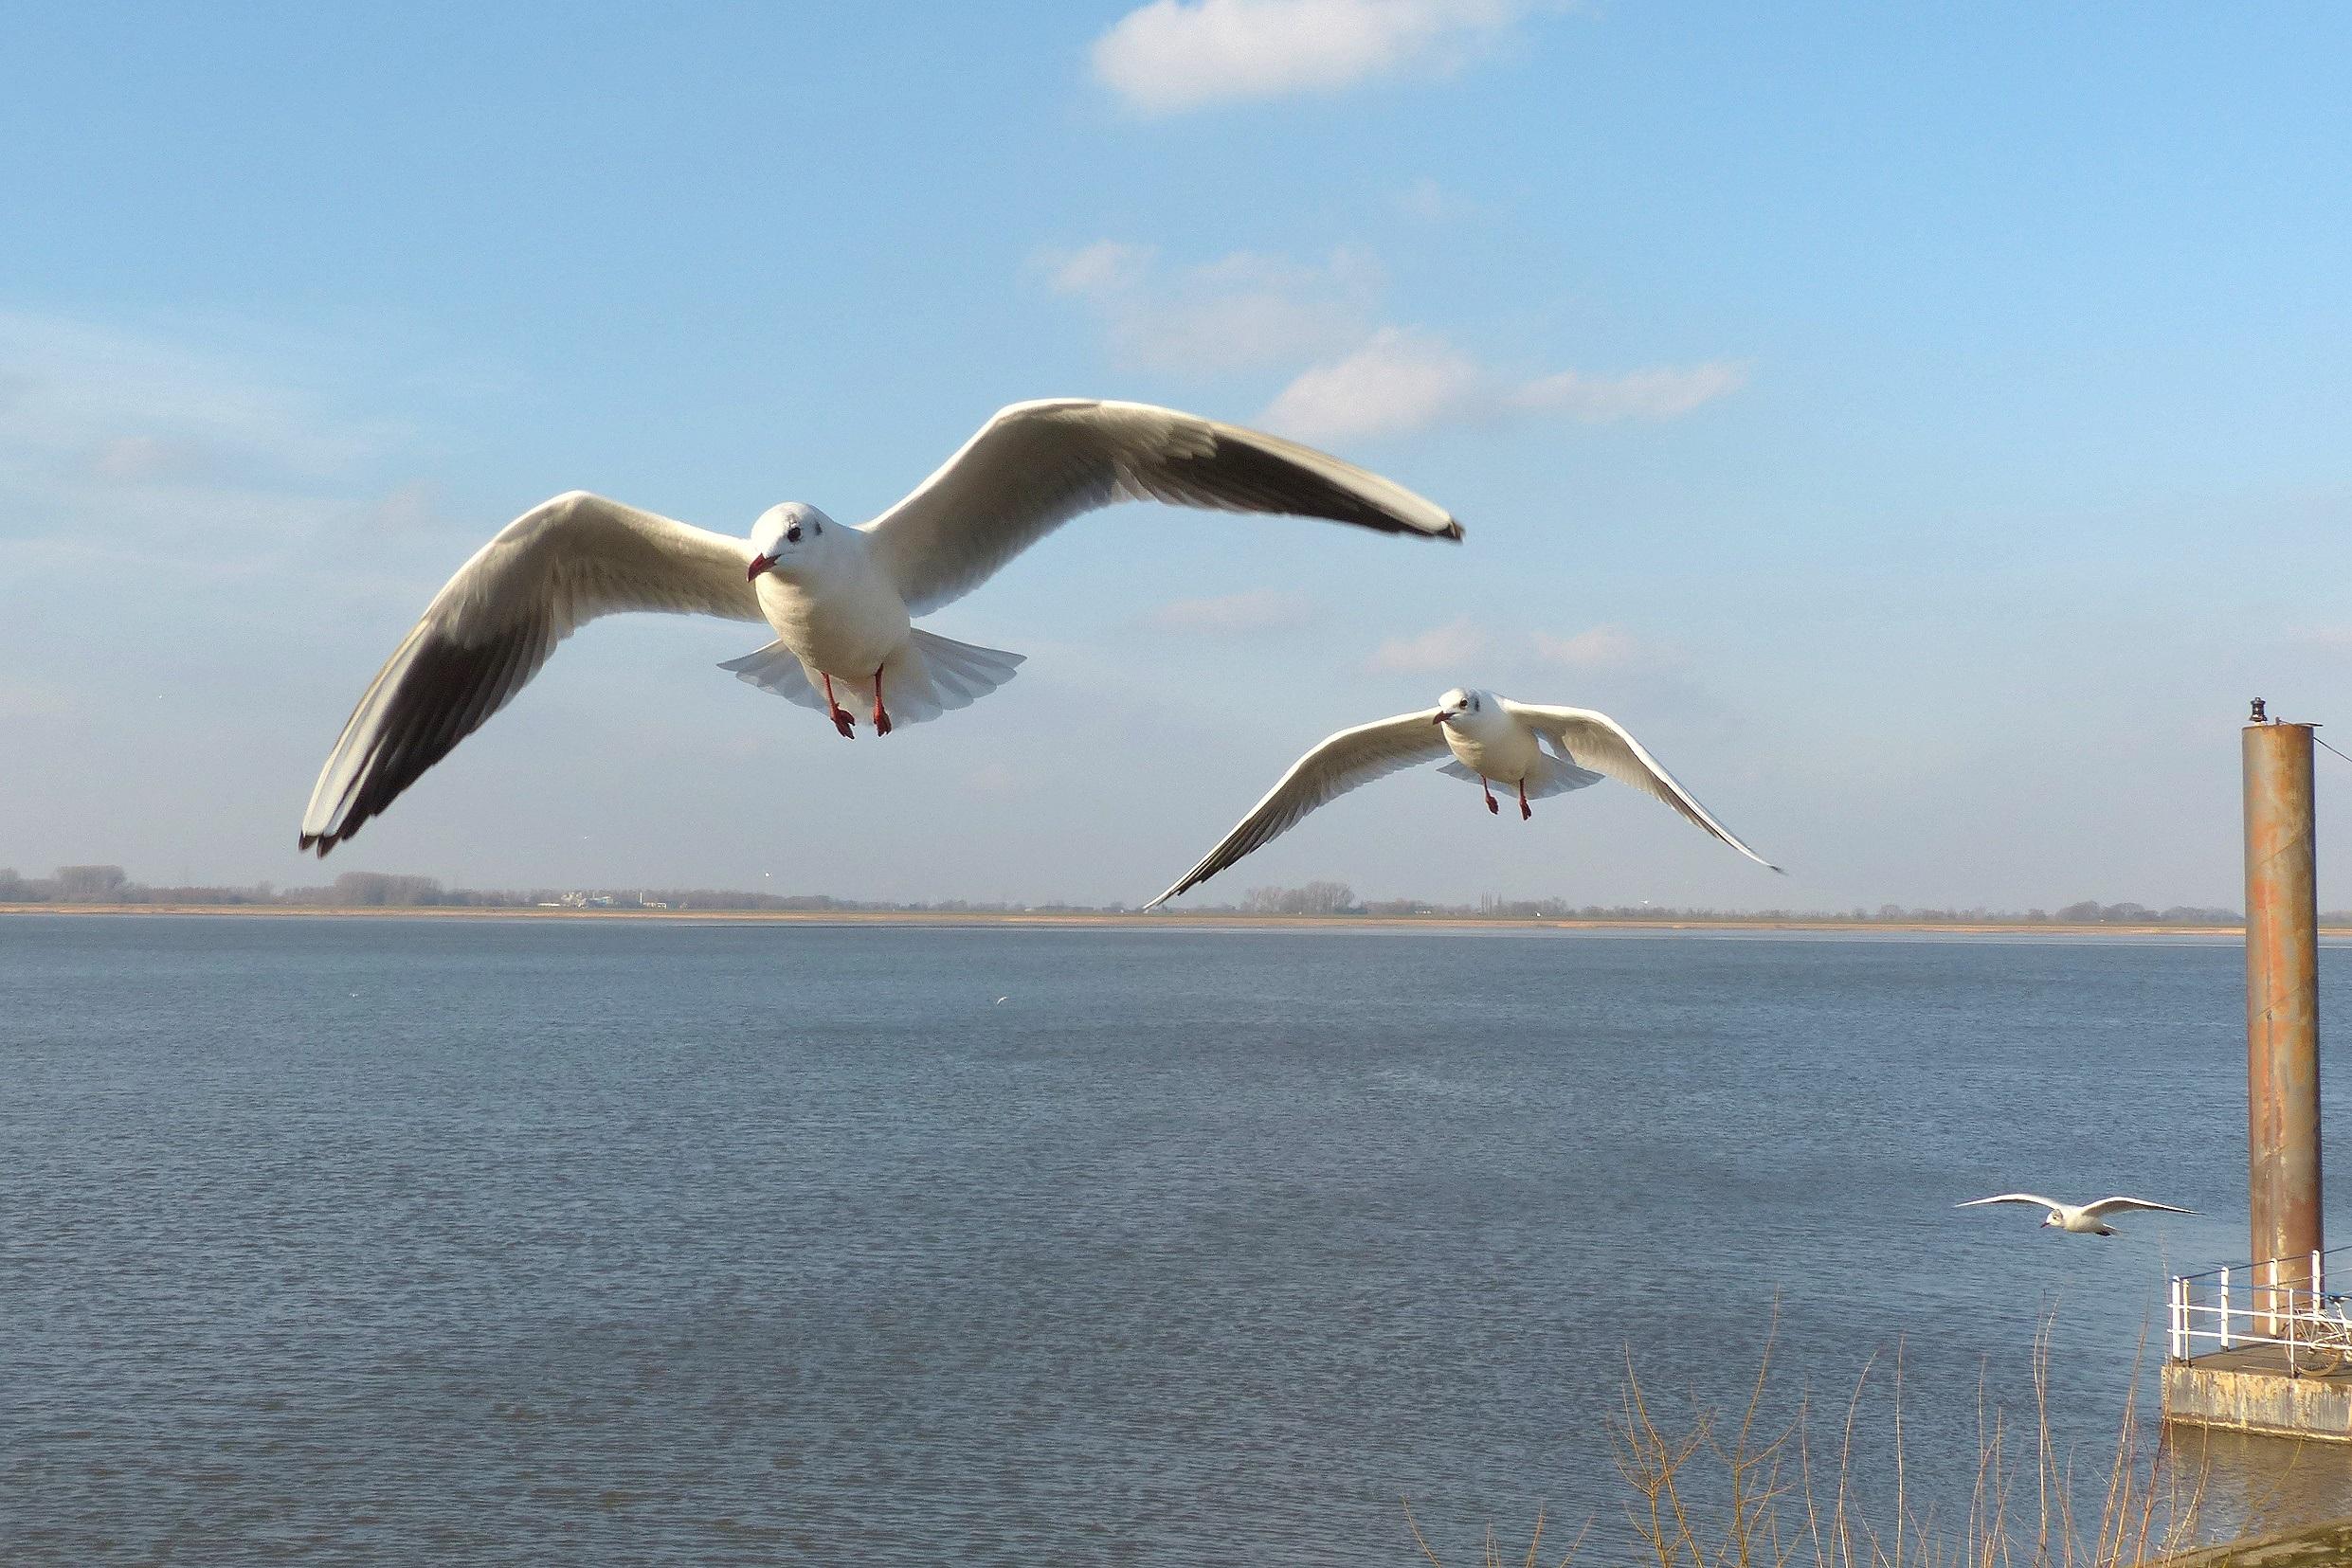 фото морских чаек в полете начинки- шапочки для